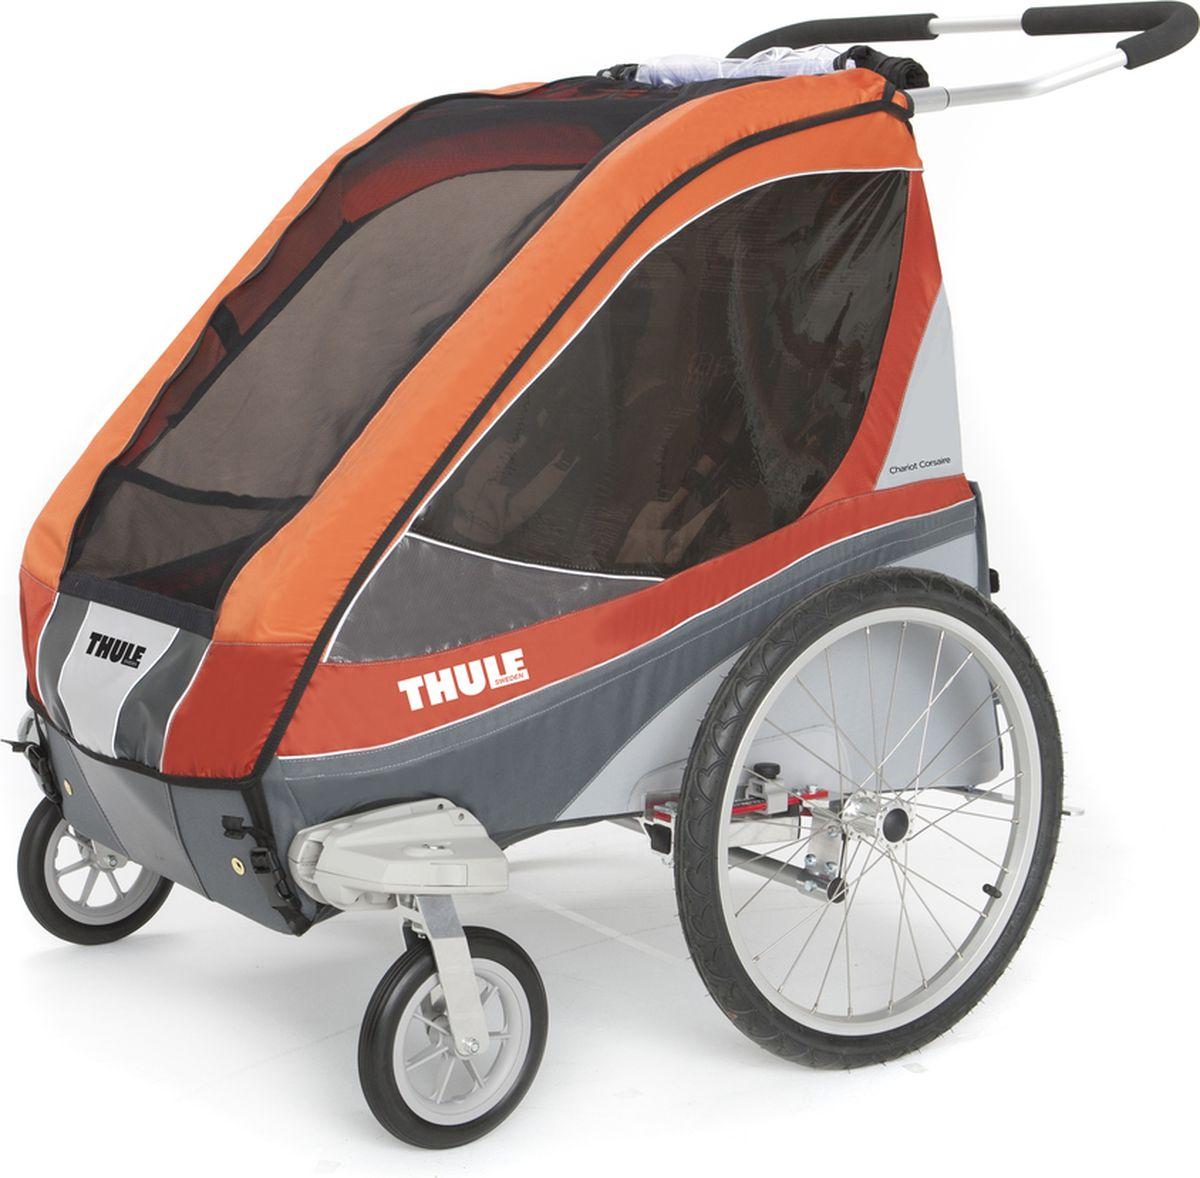 Thule Коляска-трансформер Chariot Corsaire 2 цвет абрикосовый коляска thule chariot cx2 бордовый